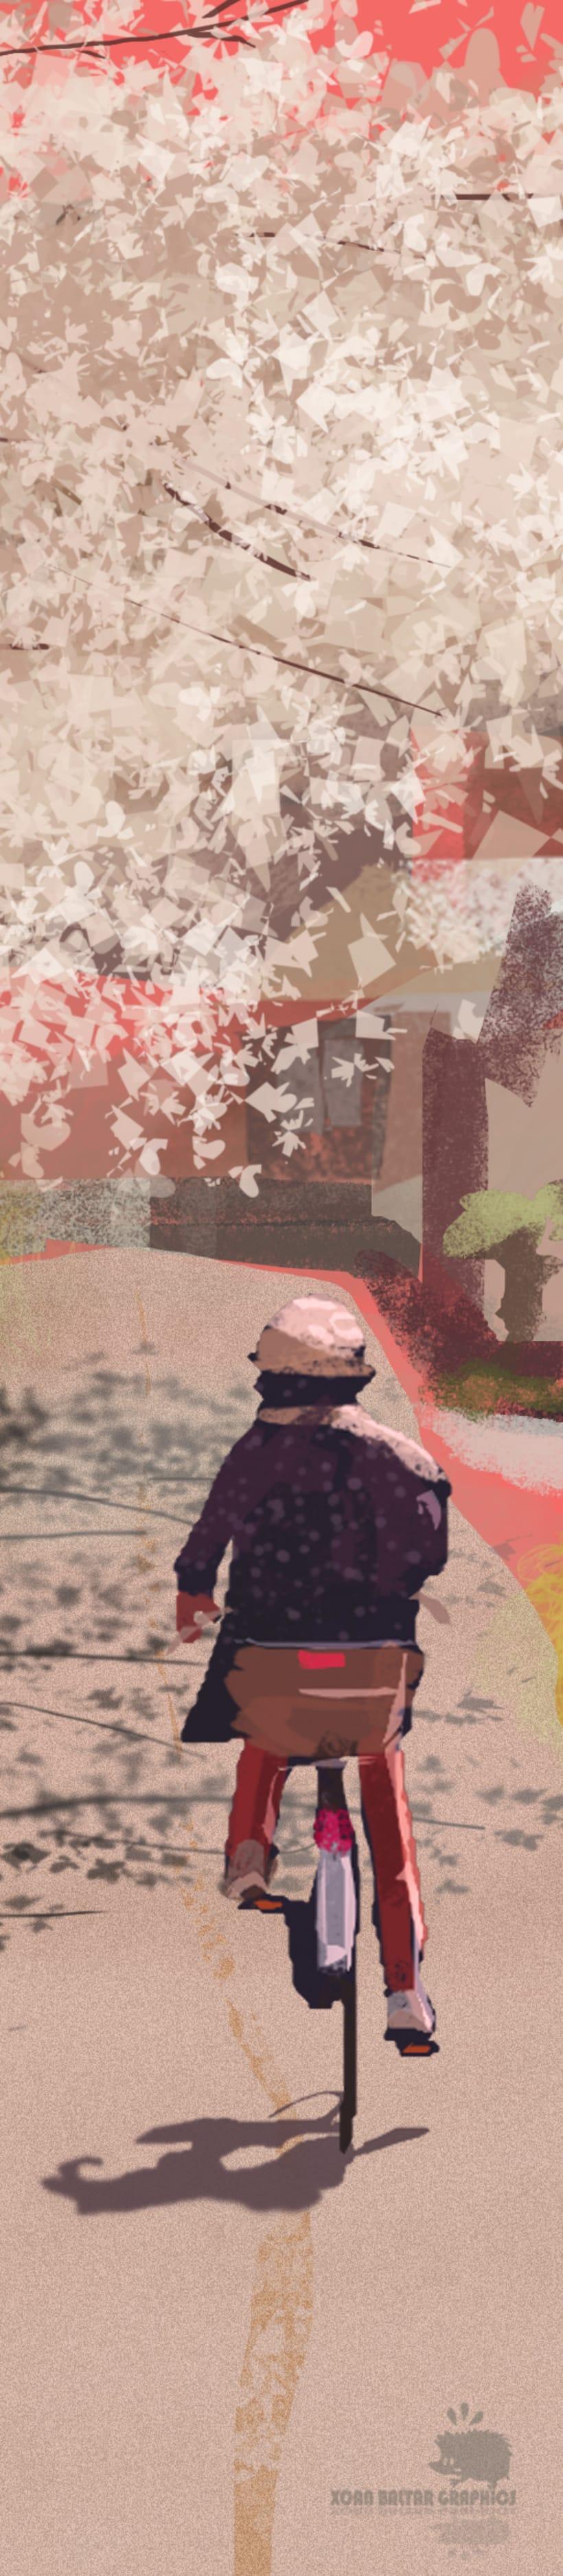 Speedpaint, ilustraciones en 30 min. 14